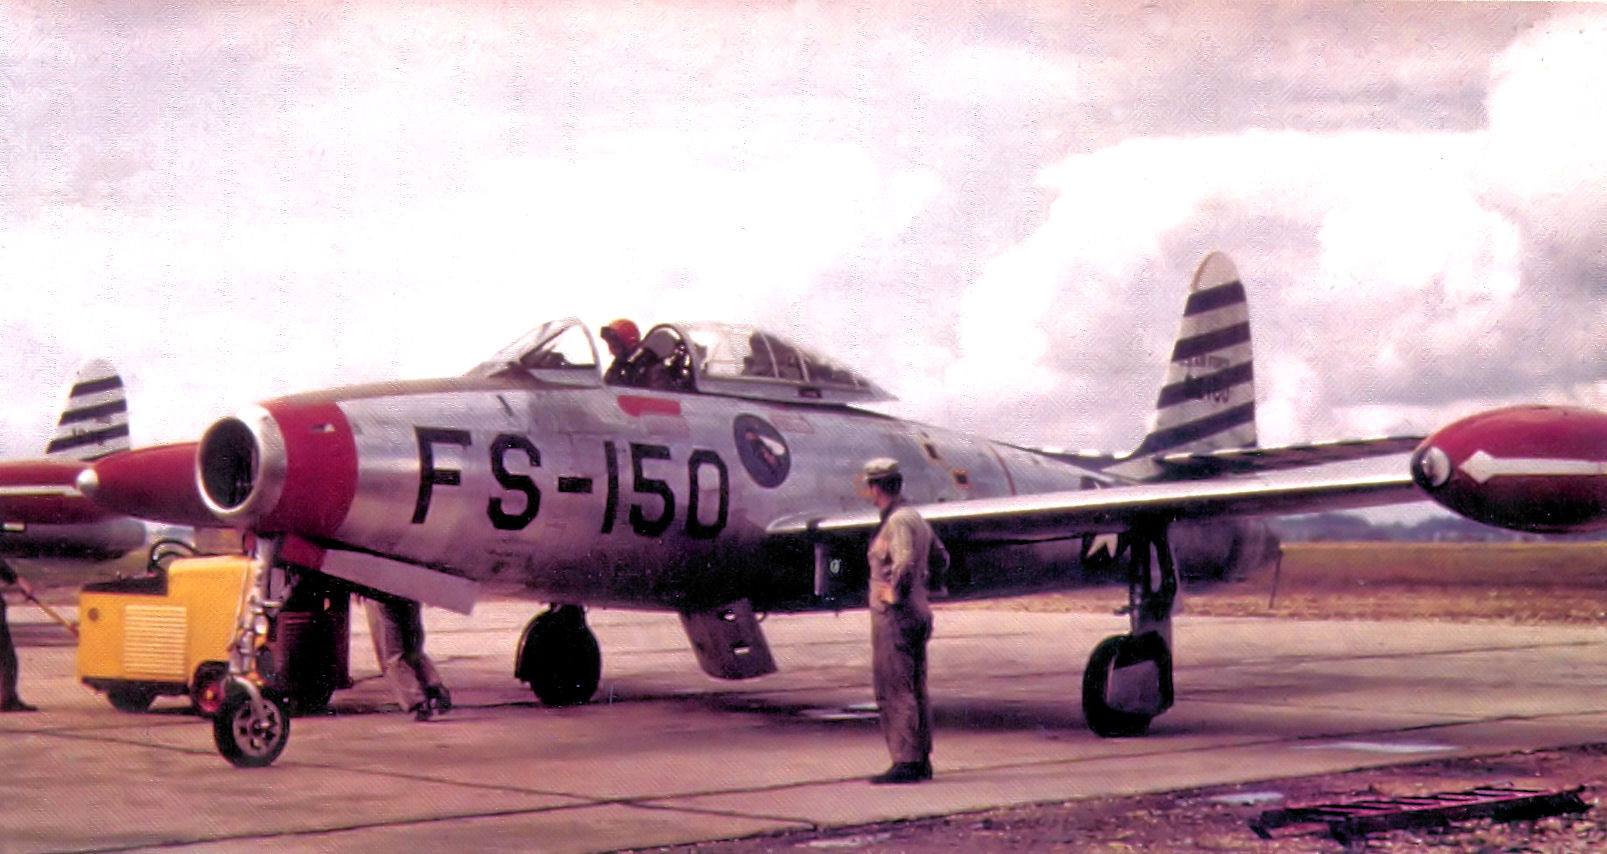 36th_Fighter-Bomber_Wing_F-84E_49-2150_F